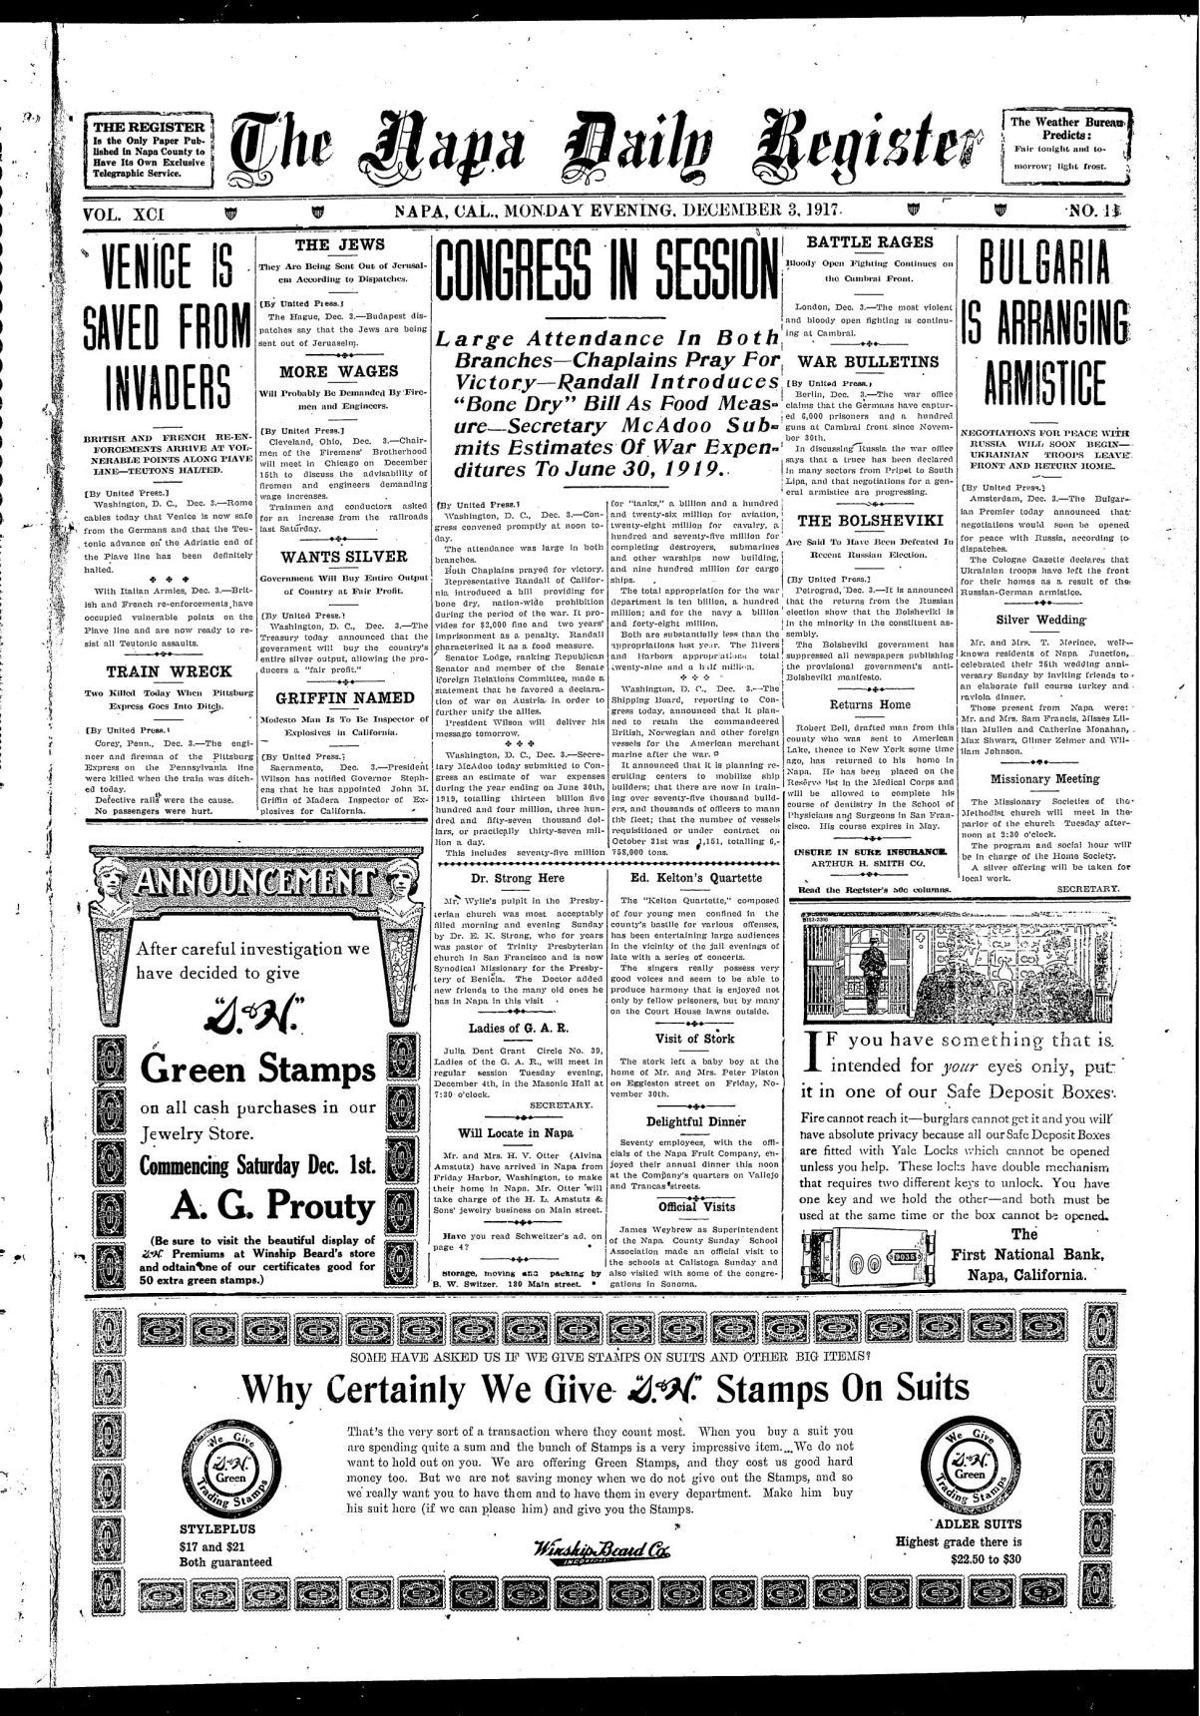 Dec. 3, 1917